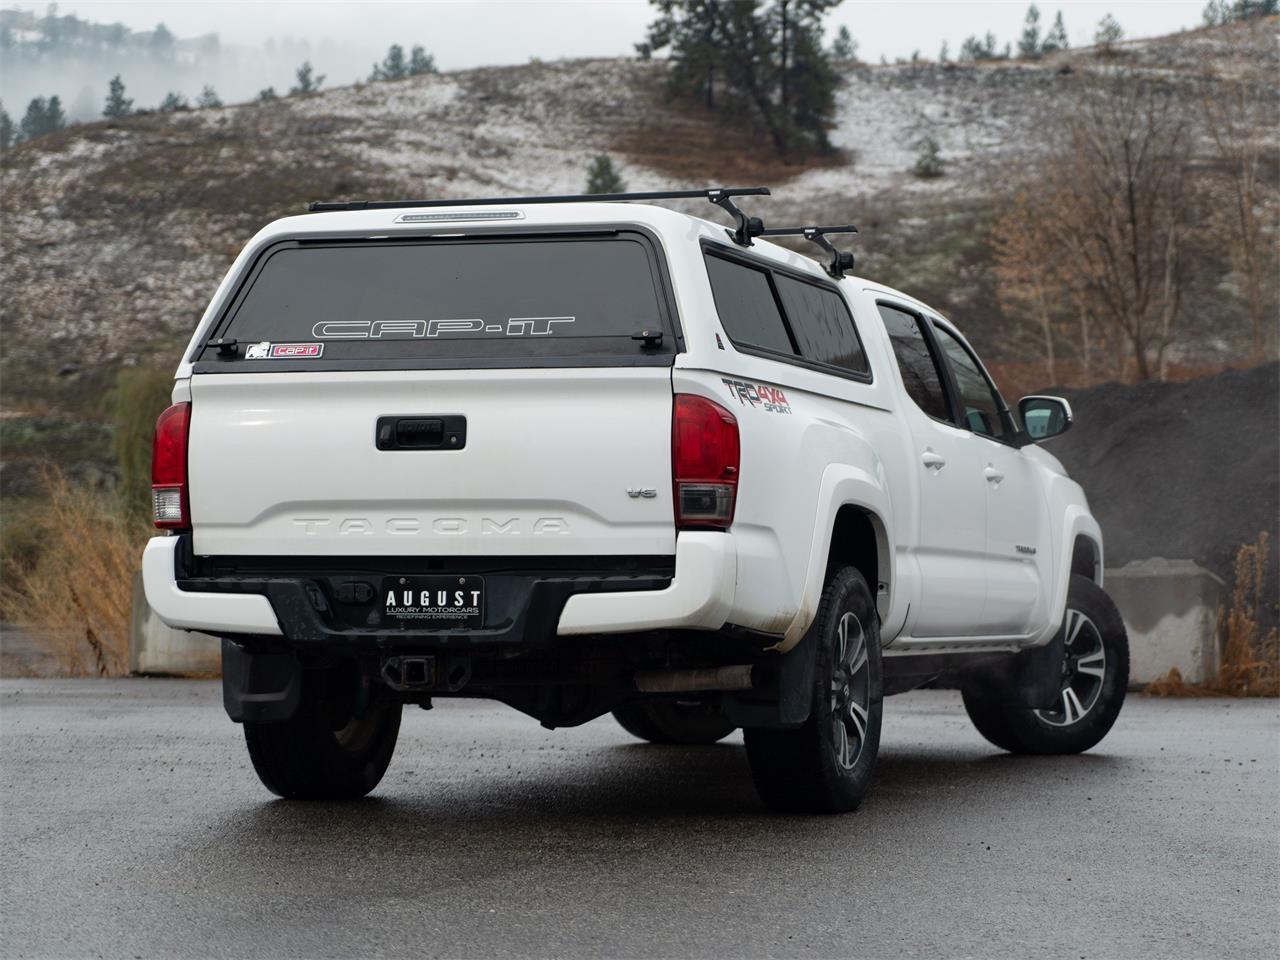 2017 Toyota Tacoma (CC-1417887) for sale in Kelowna, British Columbia